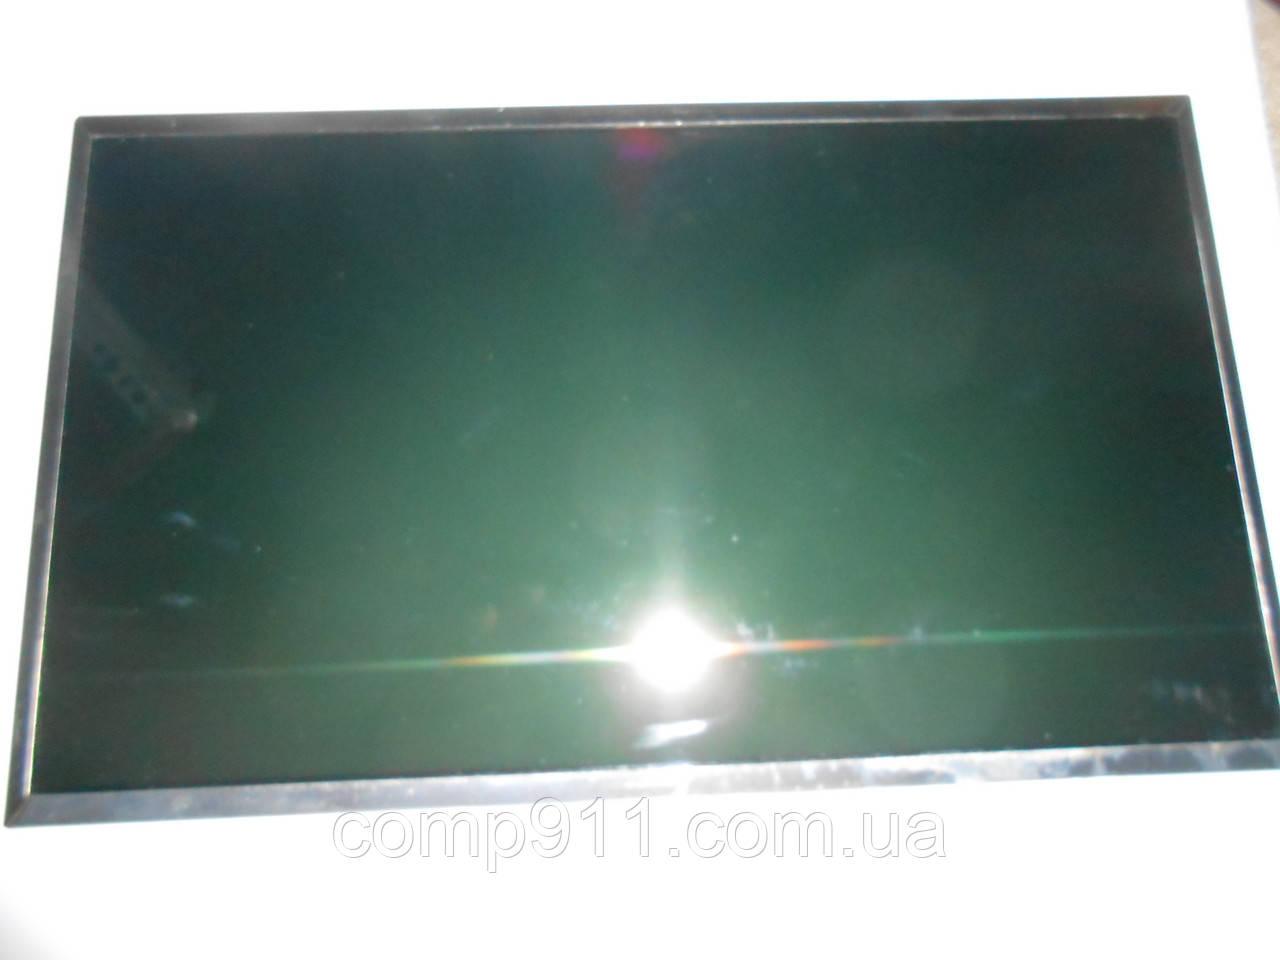 Матрица для ноутбука Матрица LTN140AT02-C07 Samsung, фото 1